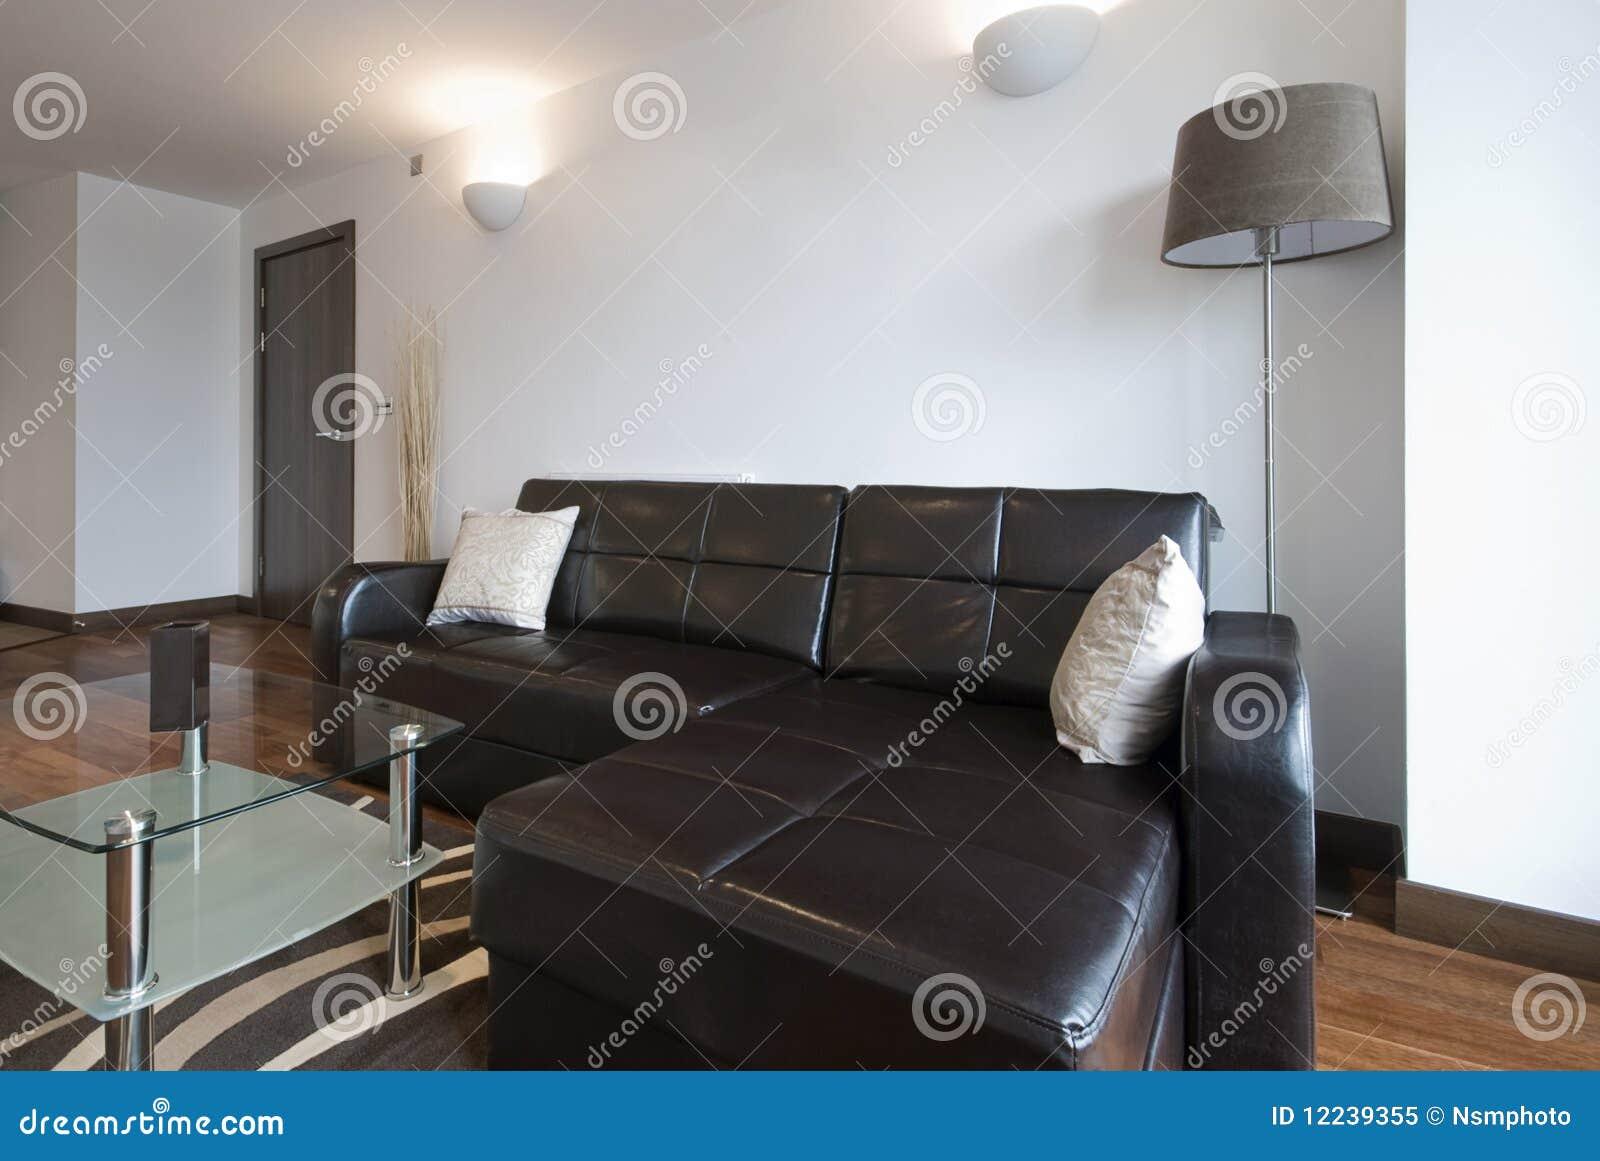 Moderne woonkamer met de grote bank van de leerhoek royalty vrije stock foto afbeelding 12239355 - Fotos van moderne woonkamer ...